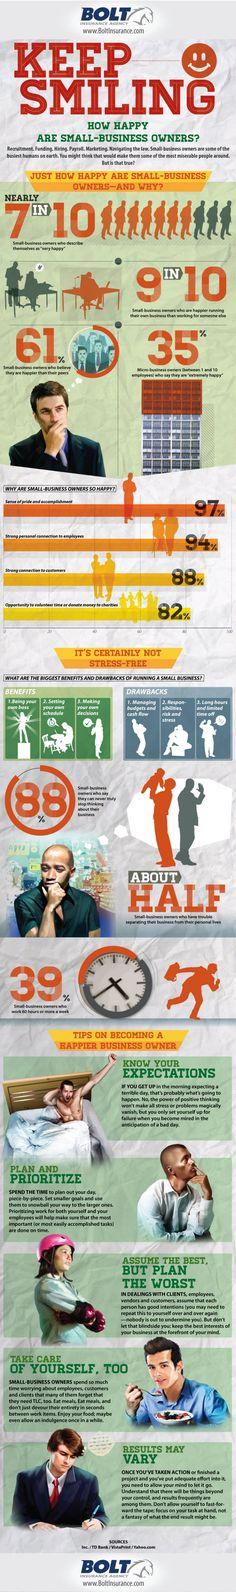 ¿Son felices los pequeños empresarios? #infografia #infographic #entrepreneurship